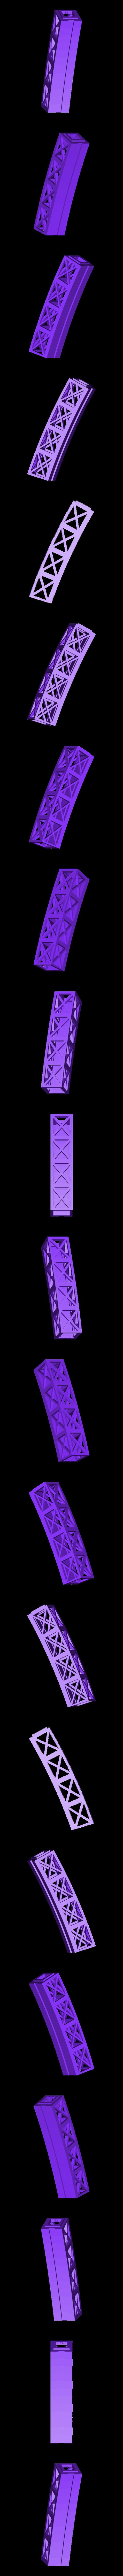 SEG_E-2.stl Download free STL file LED bridge lamp • Model to 3D print, Opossums